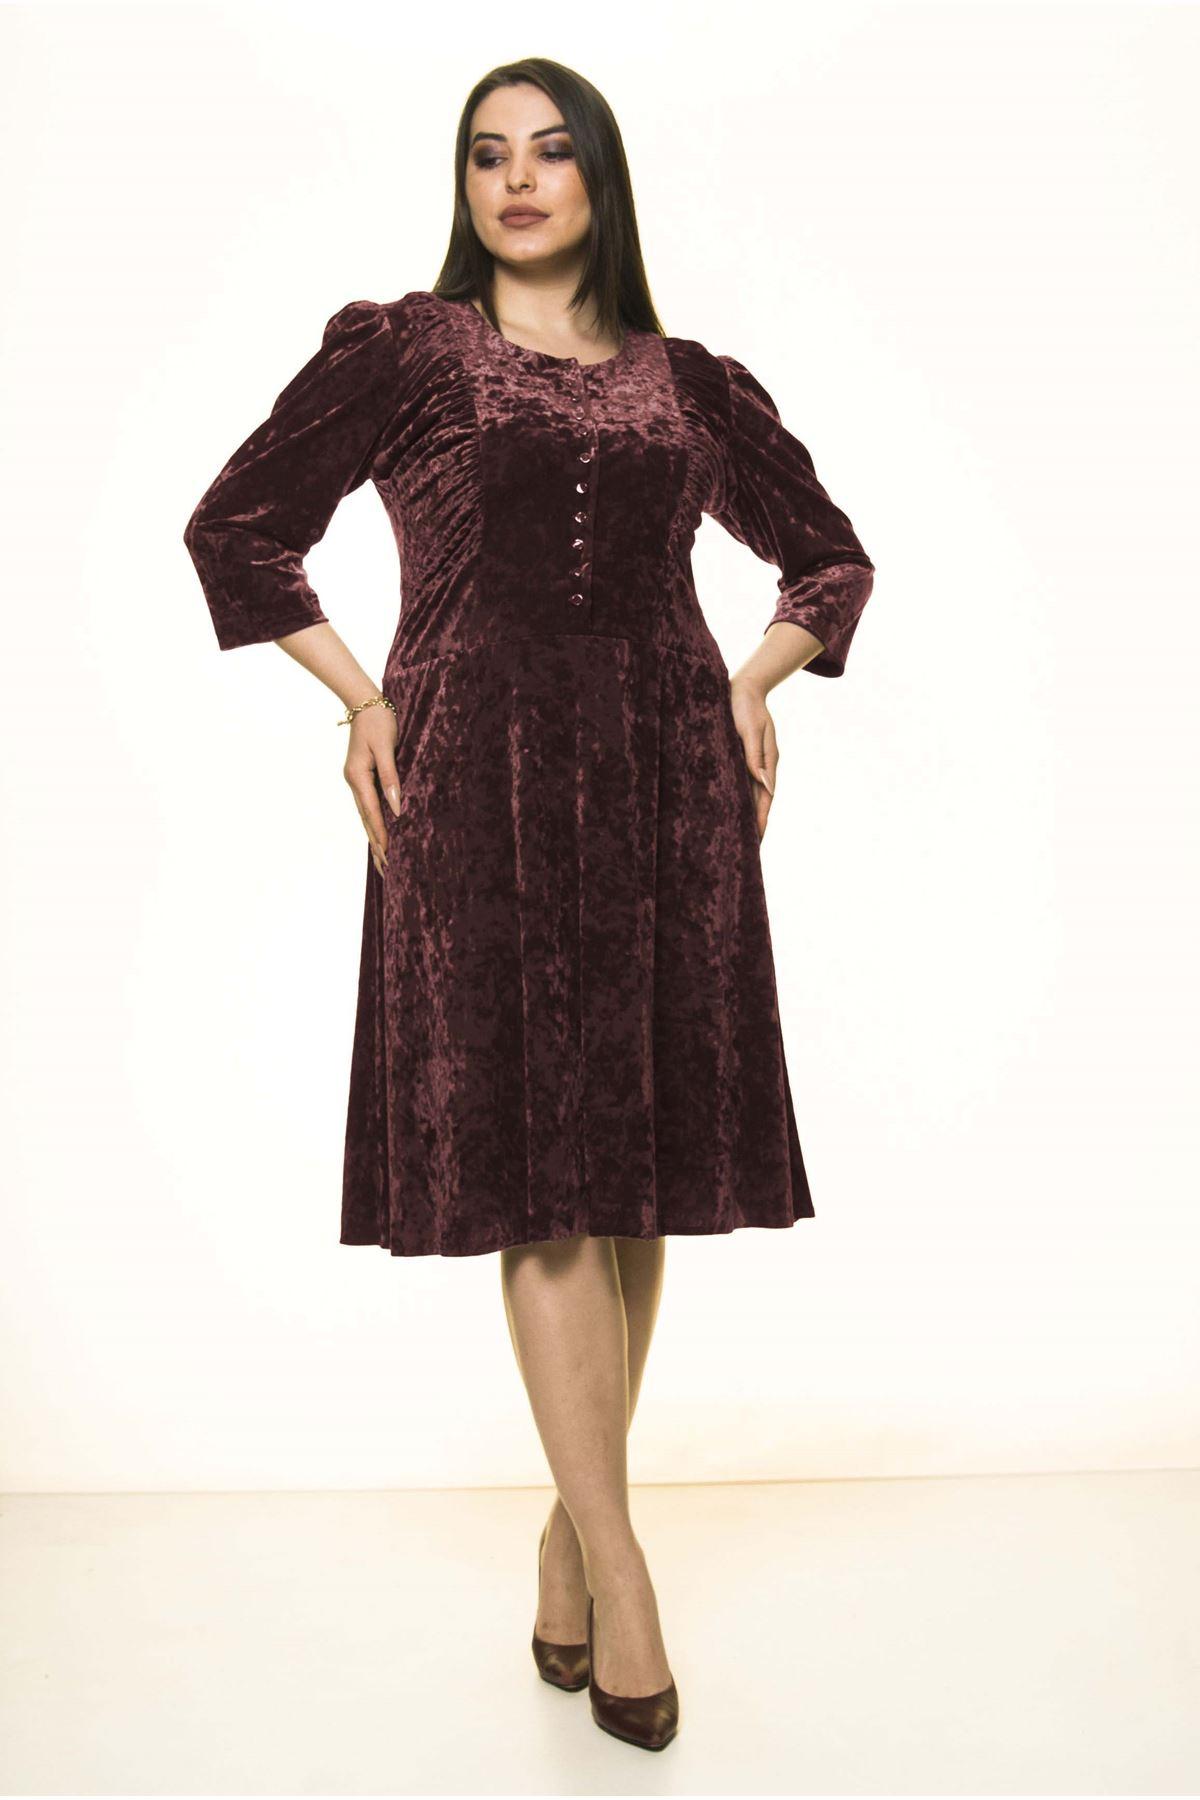 Bordo Kadife Büyük Beden Elbise 7A-1582